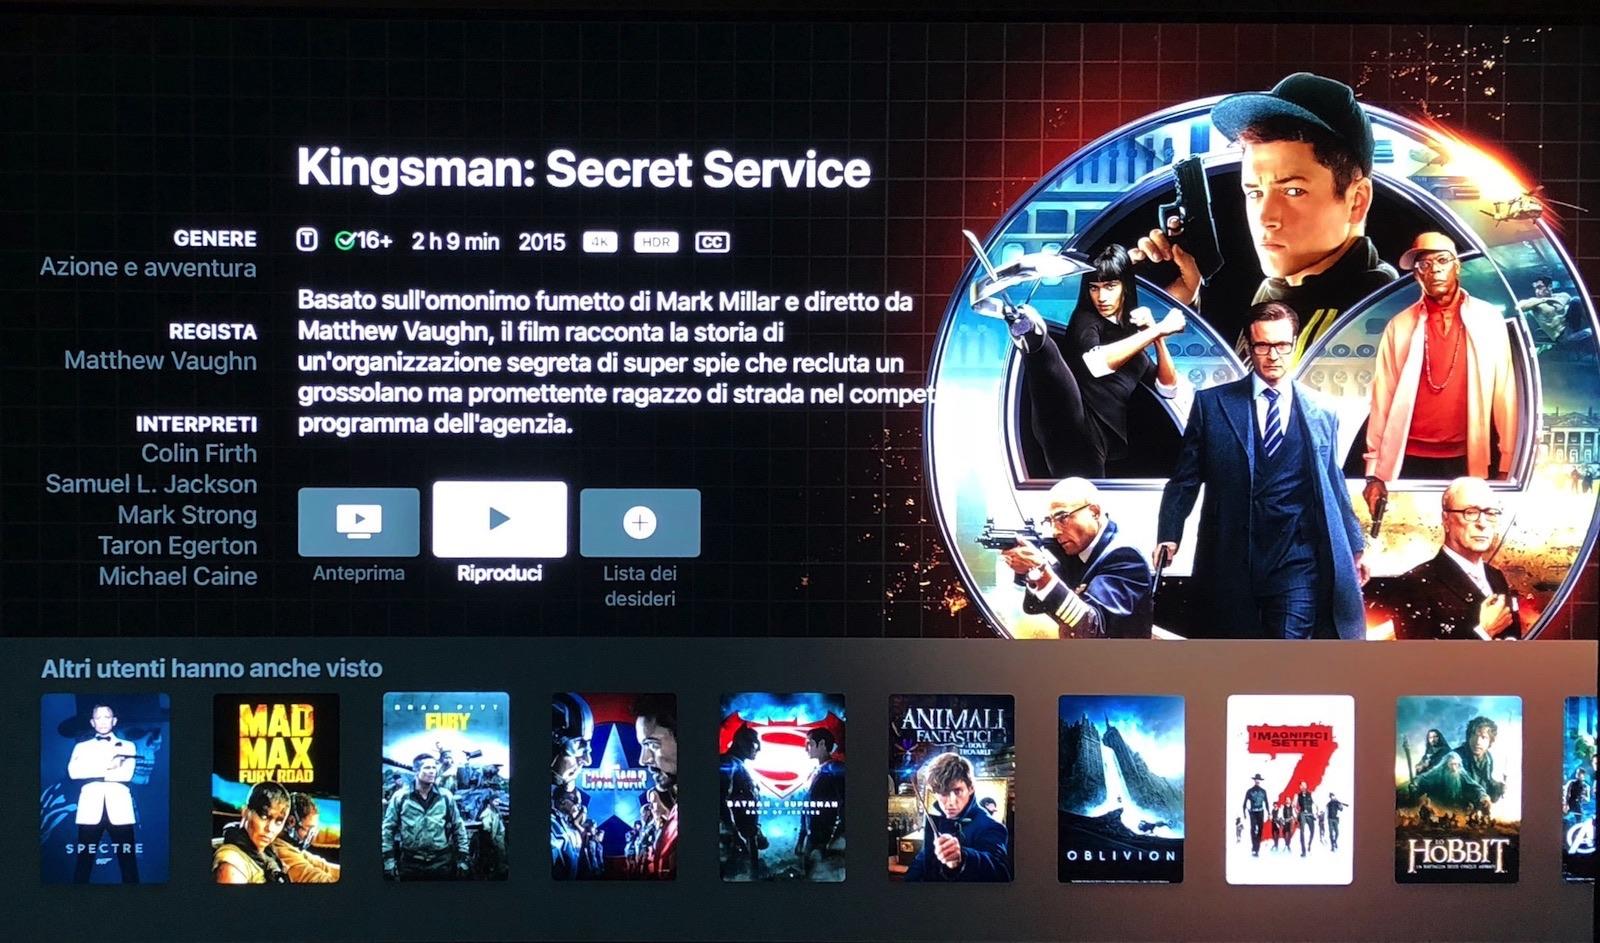 kingsman nella recensione Apple TV 4K